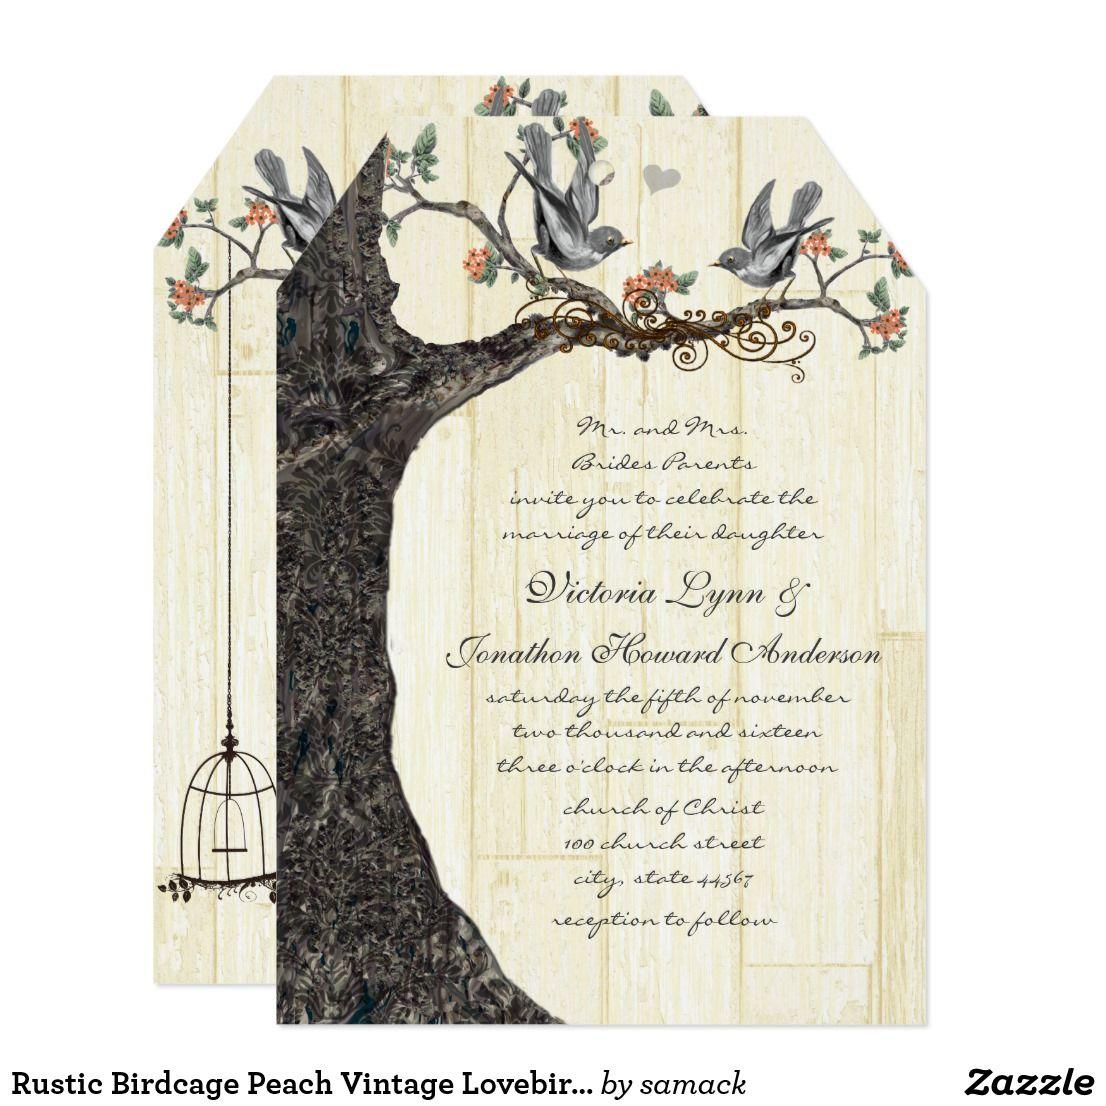 Rustic Birdcage Peach Vintage Lovebirds Wedding Card Wedding Card